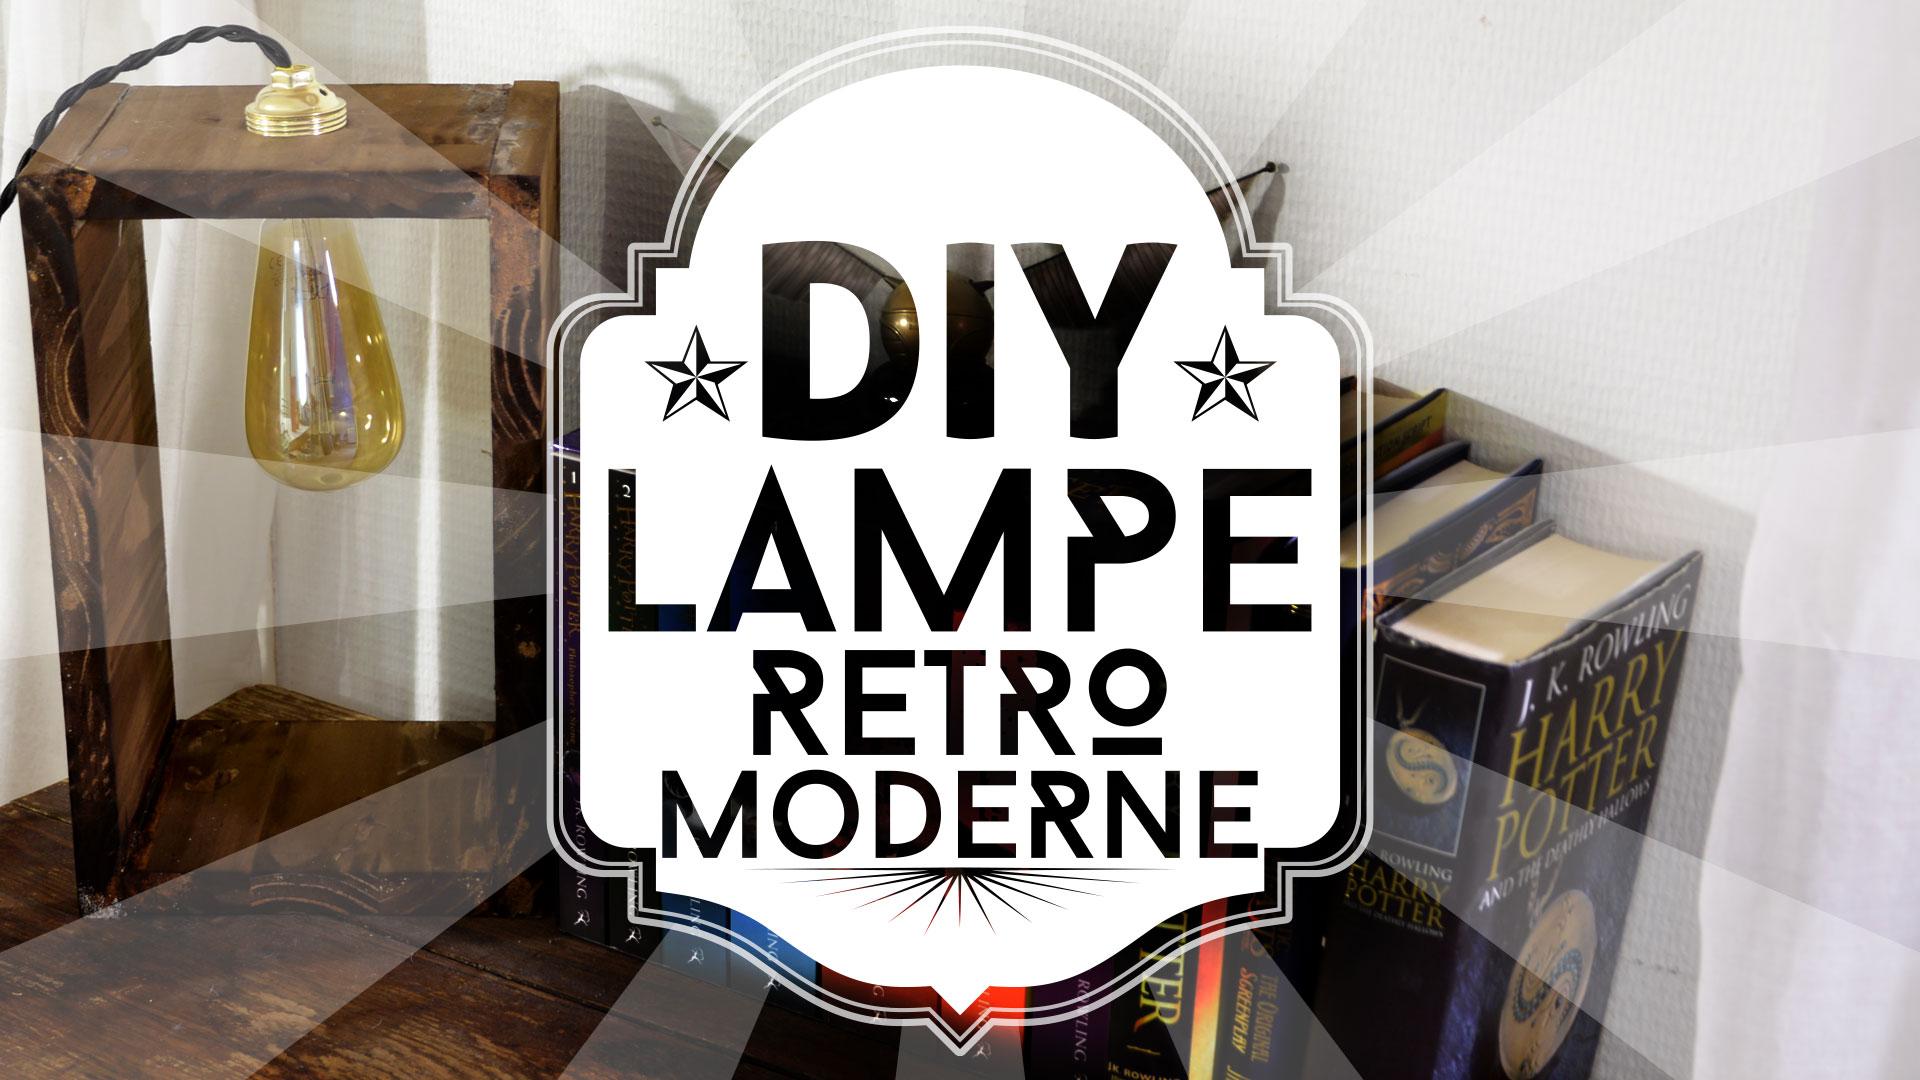 Une lampe retro-moderne